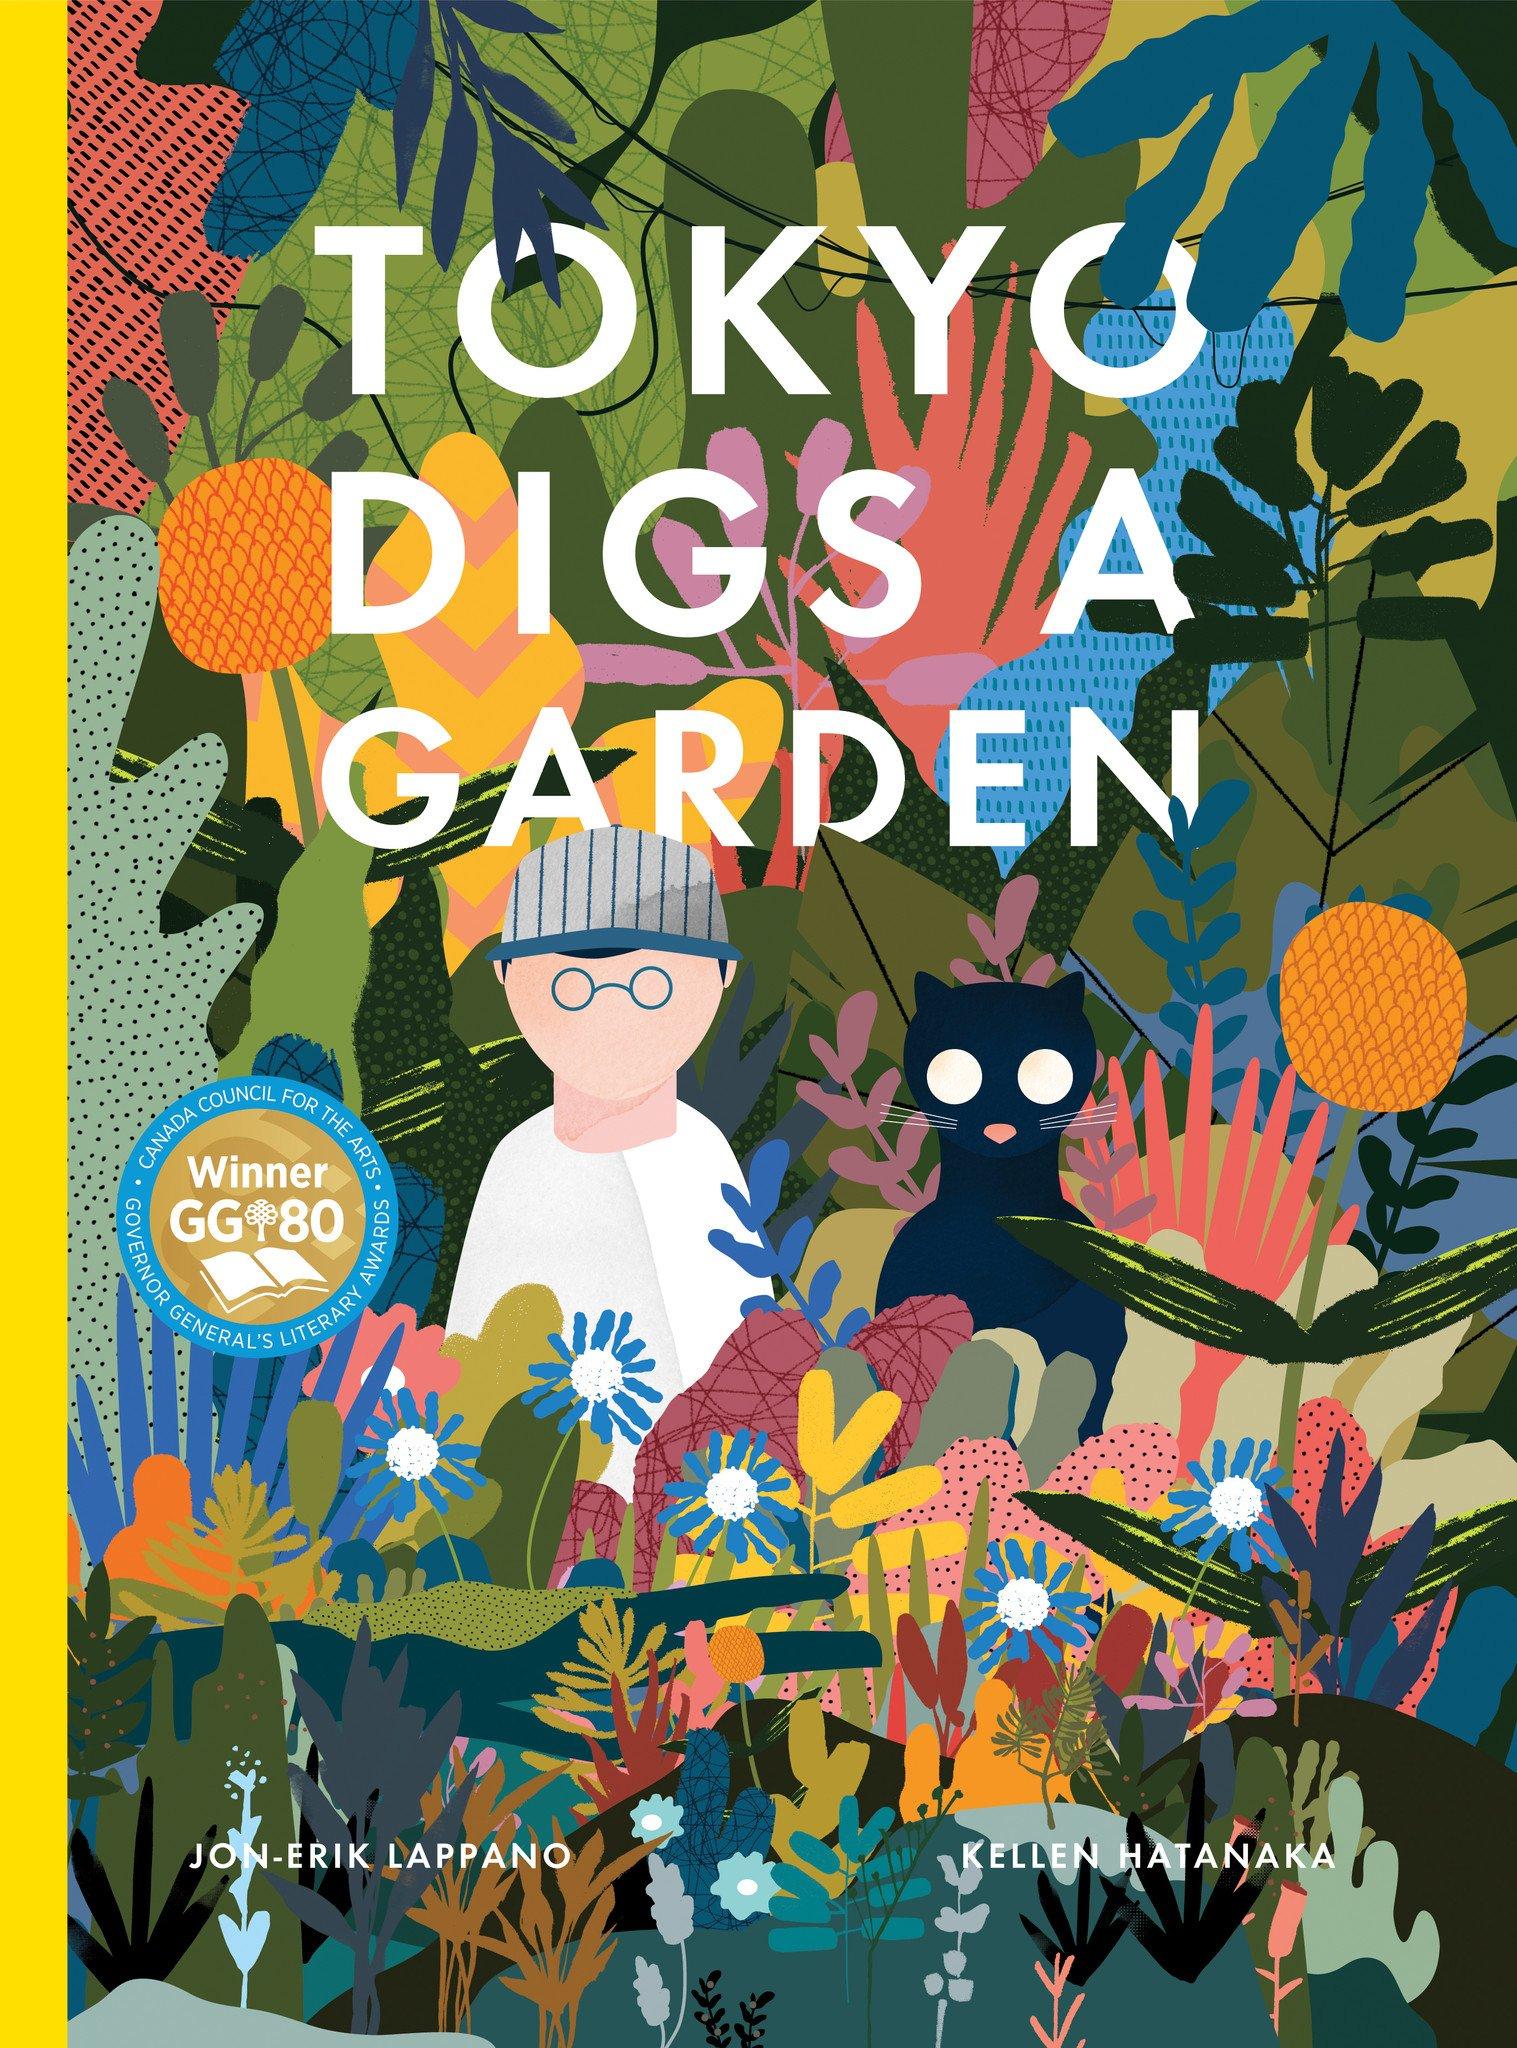 TOKYO DIGS A GARDEN - ★ 2016 Governor General's Literary Award Winner★ 2017 TD Canadian Children's Literature Award Finalist★ 2018 Sakura Medal Picture Book Nominee